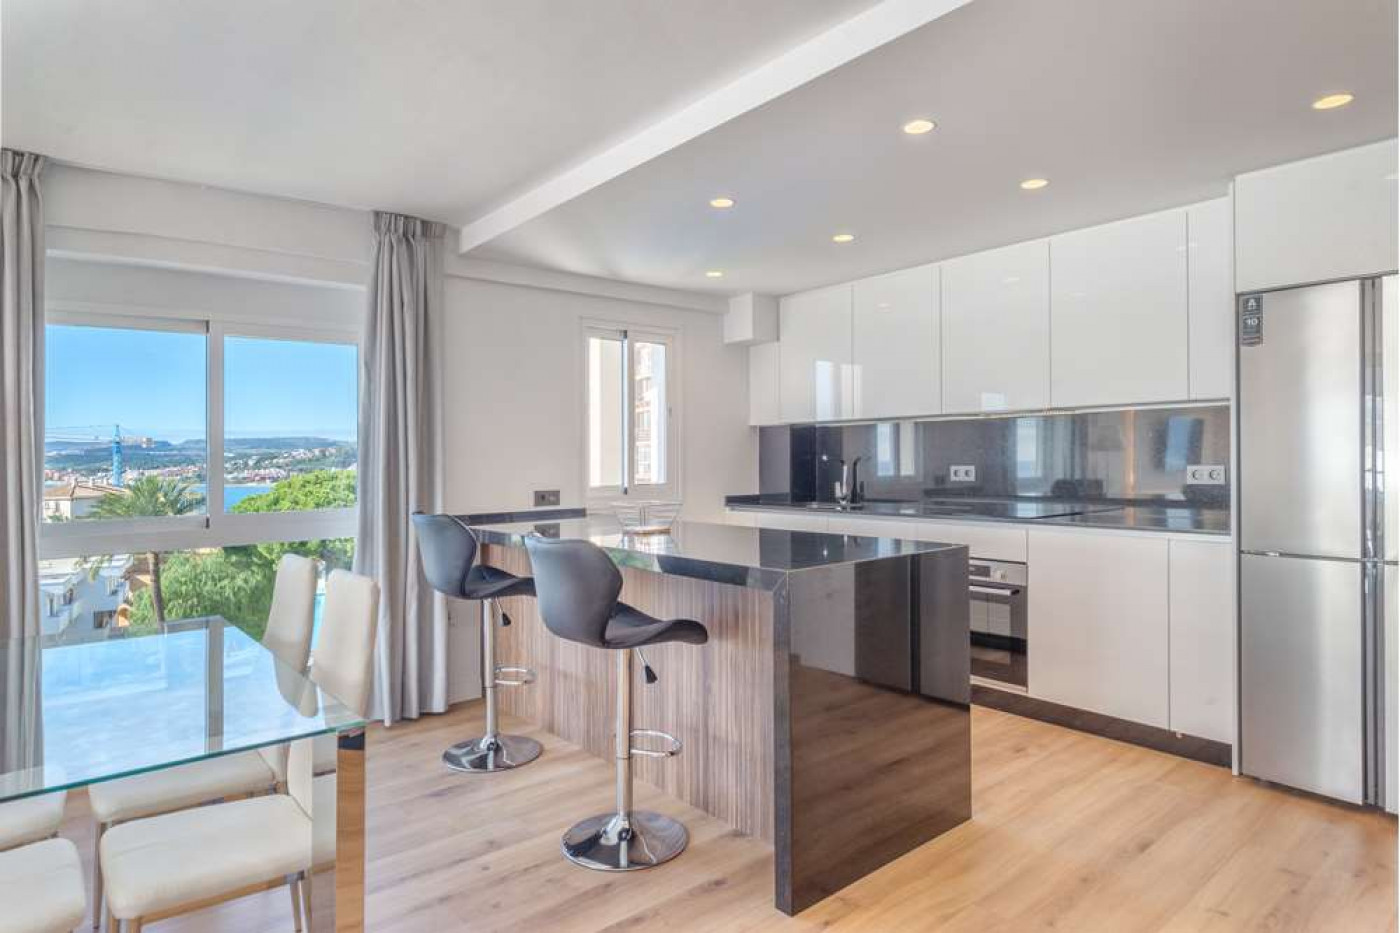 Apartment for sale in Estepona, Estepona